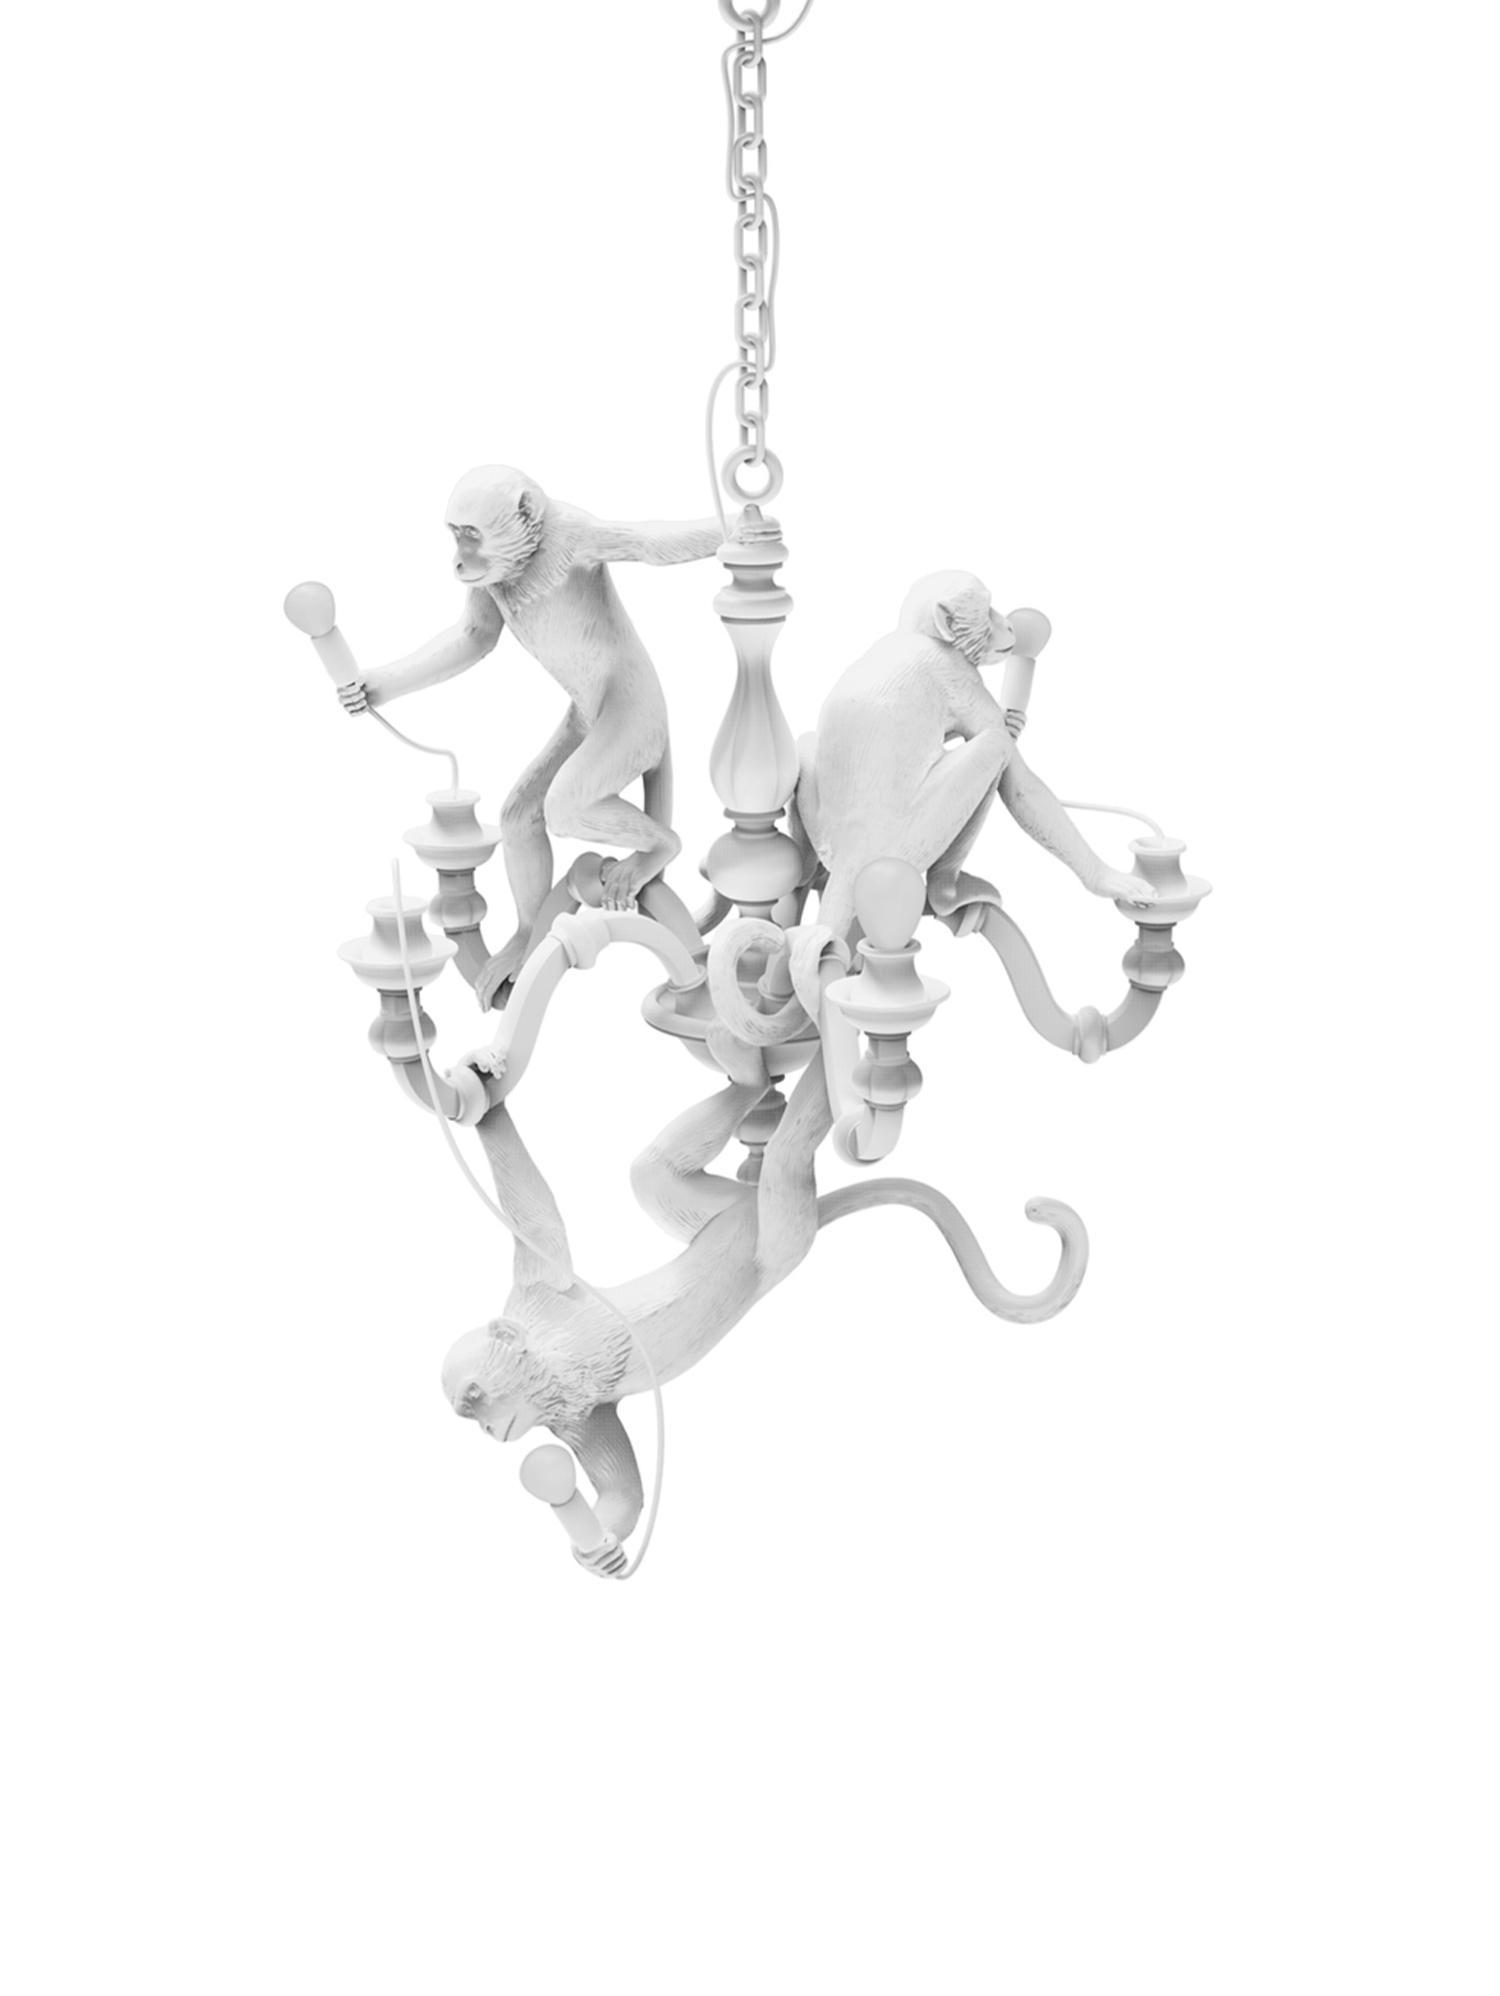 Lampada a sospensione Monkey Chandelier, Poliresina, metallo, Bianco, Ø 80 x Alt. 105 cm